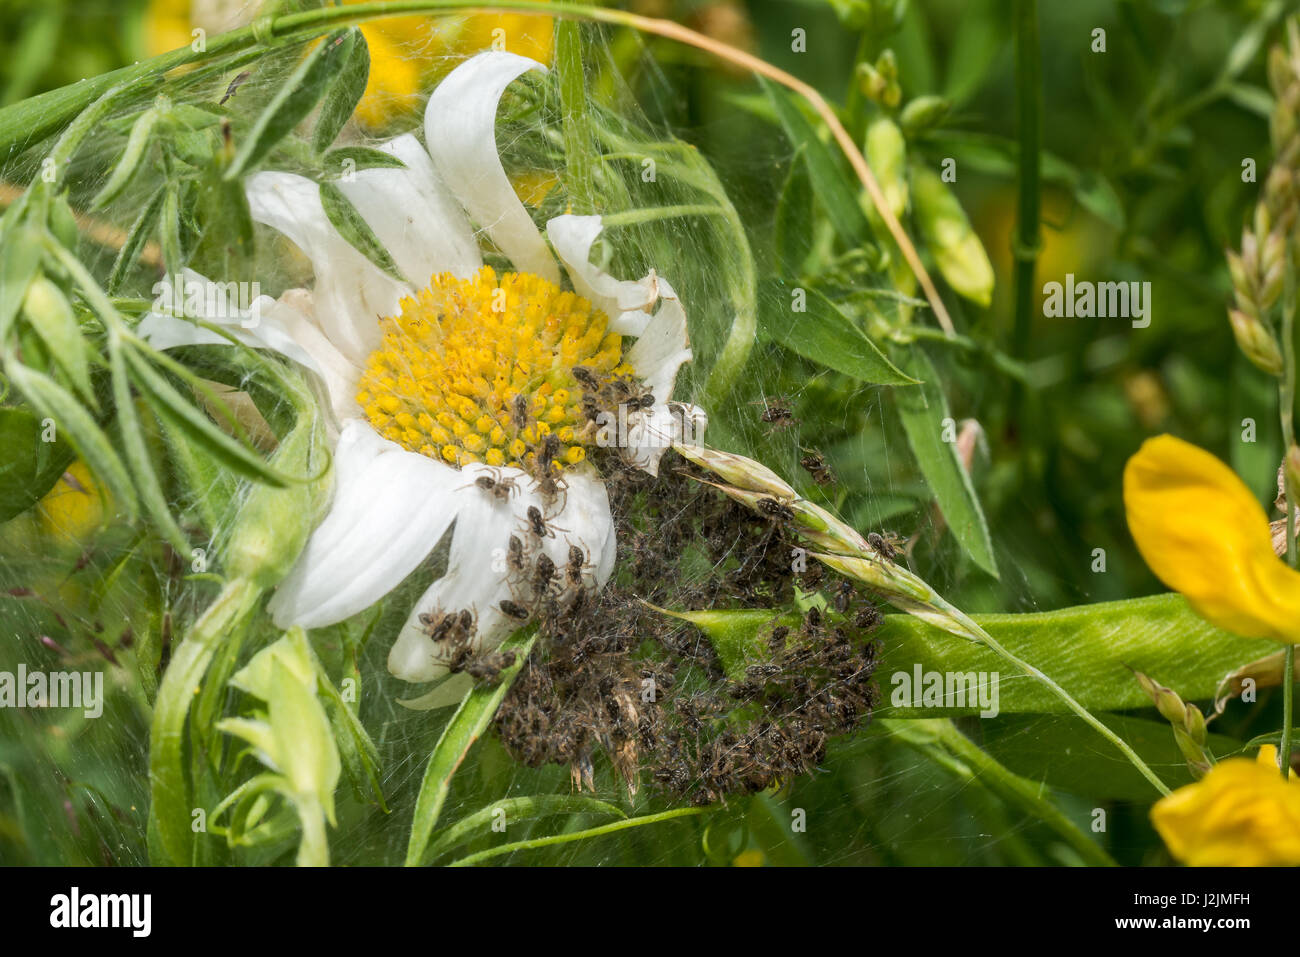 Spiderling crèche ou garderie sur Marguerite blanche Photo Stock